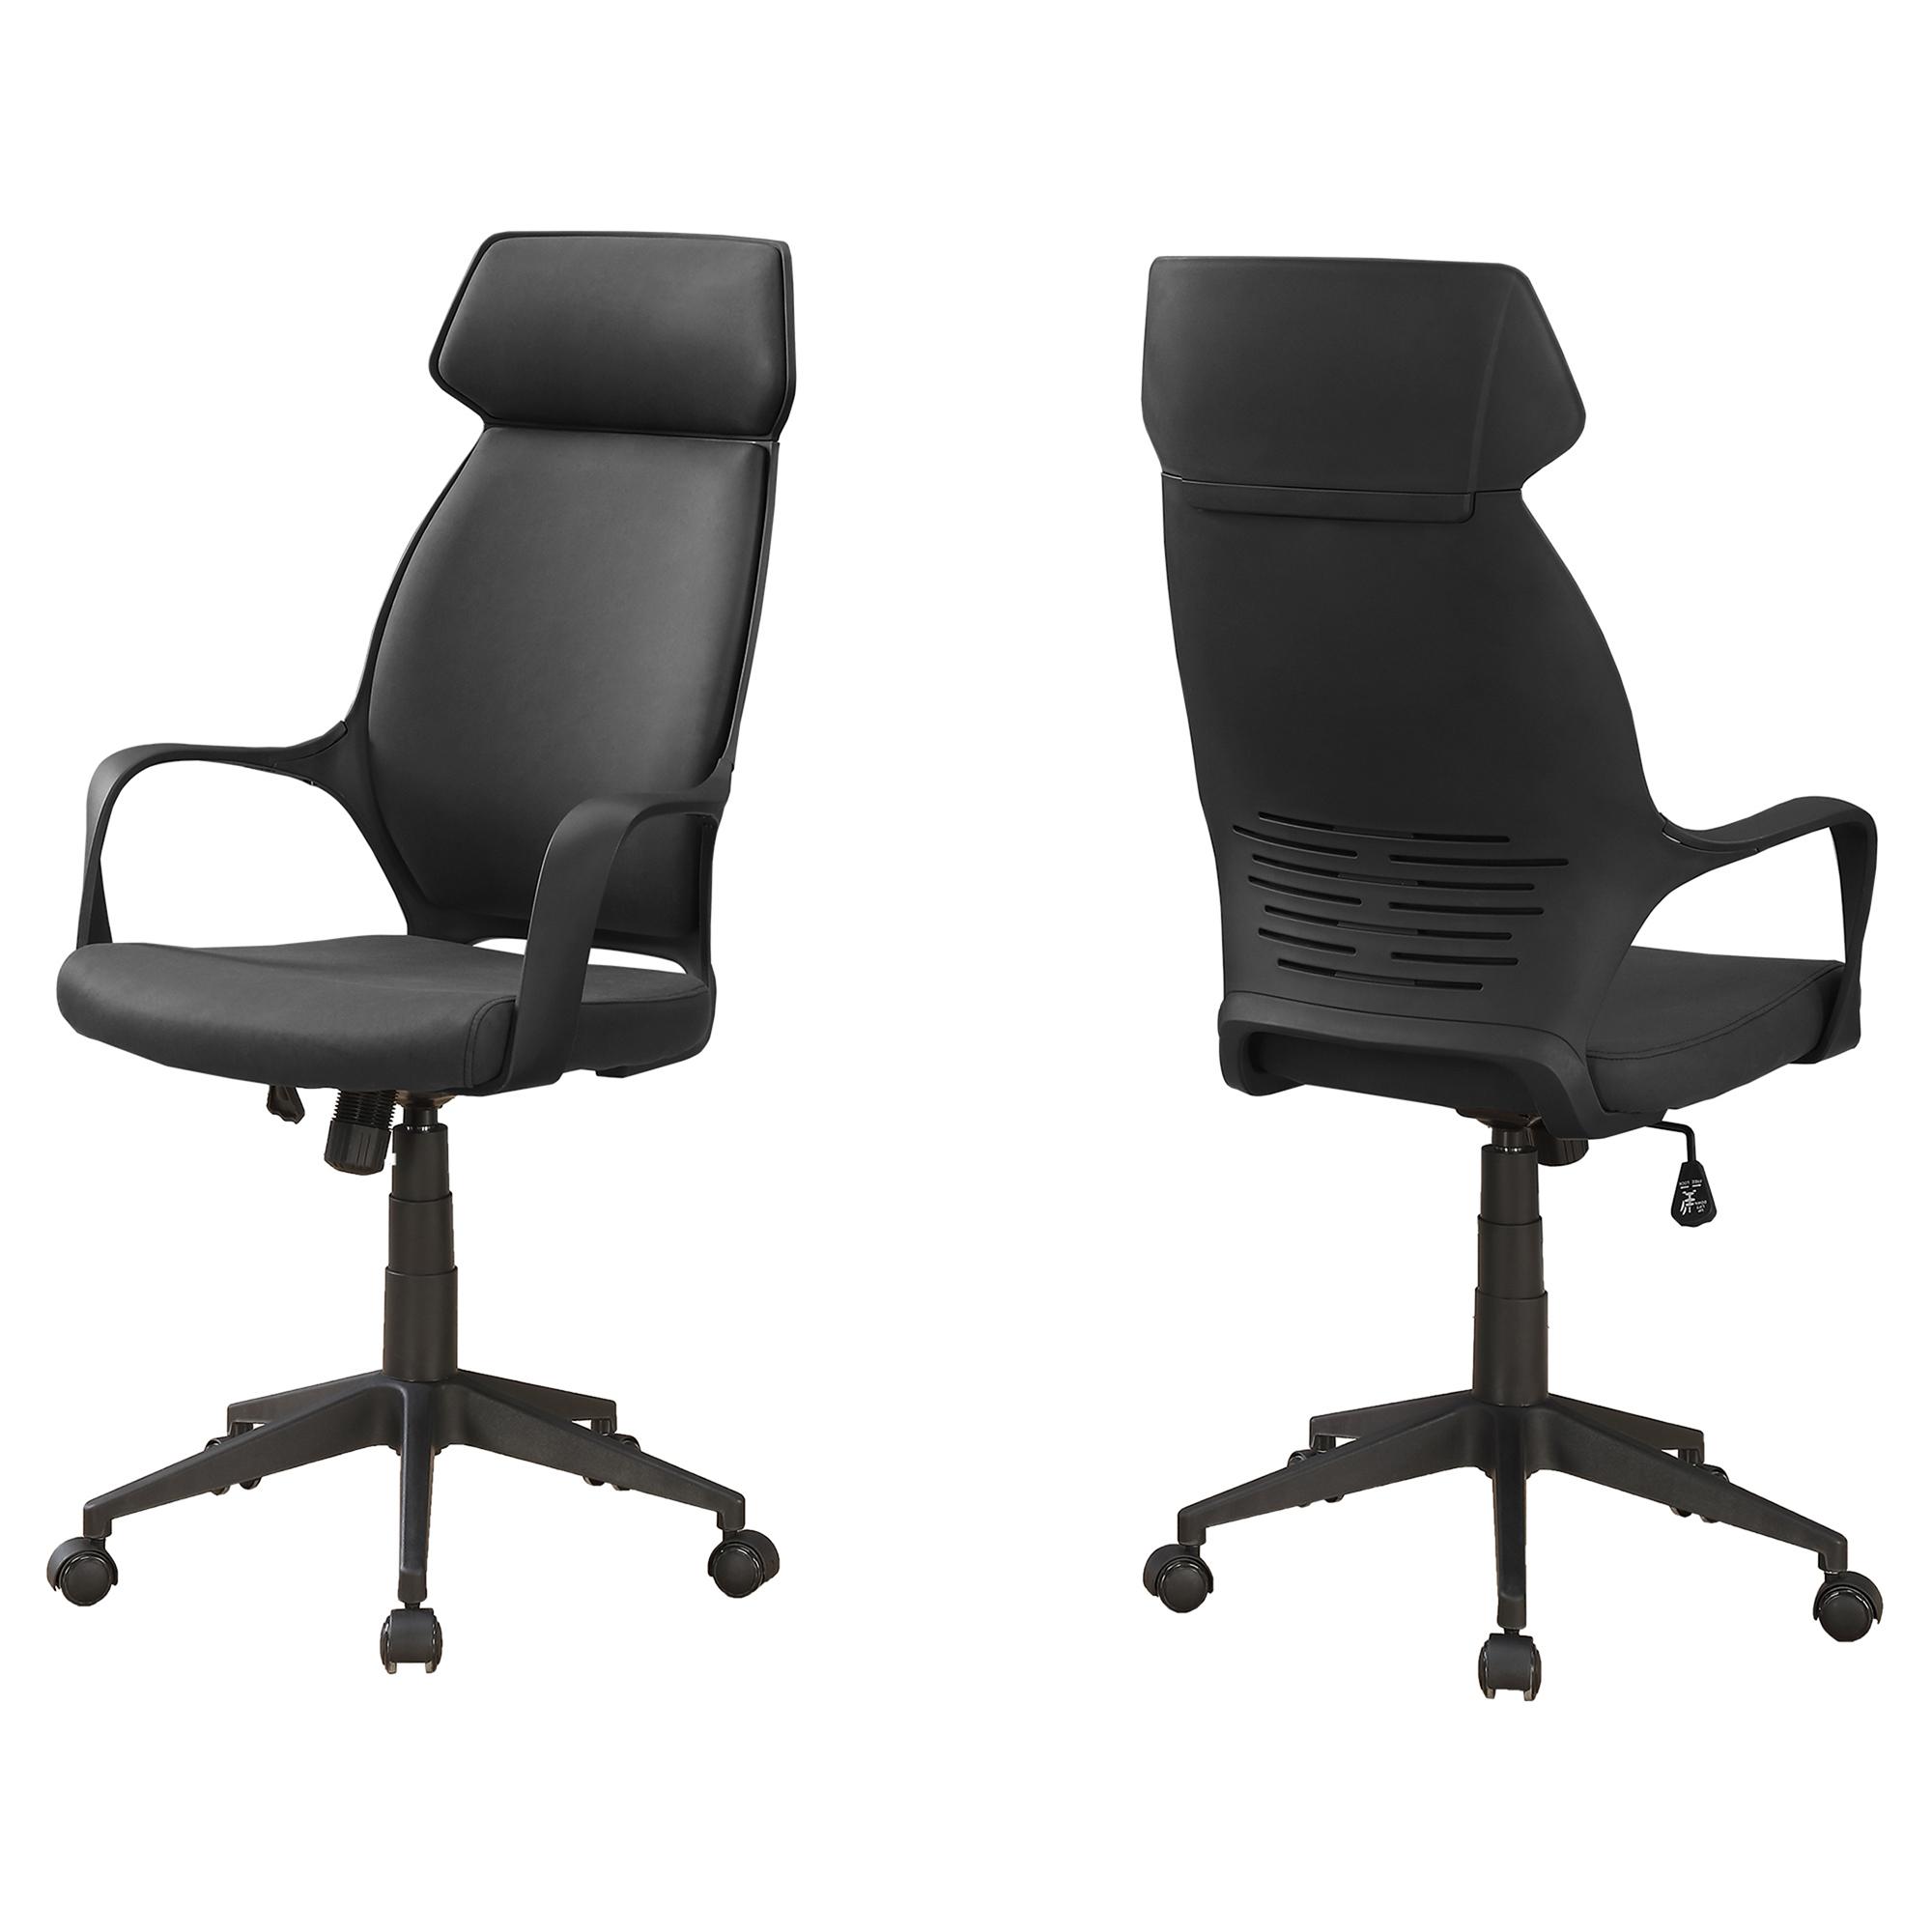 "26"" x 25"" x 96"" Black  Foam  Polypropylene  Microfiber  High Back Office Chair"